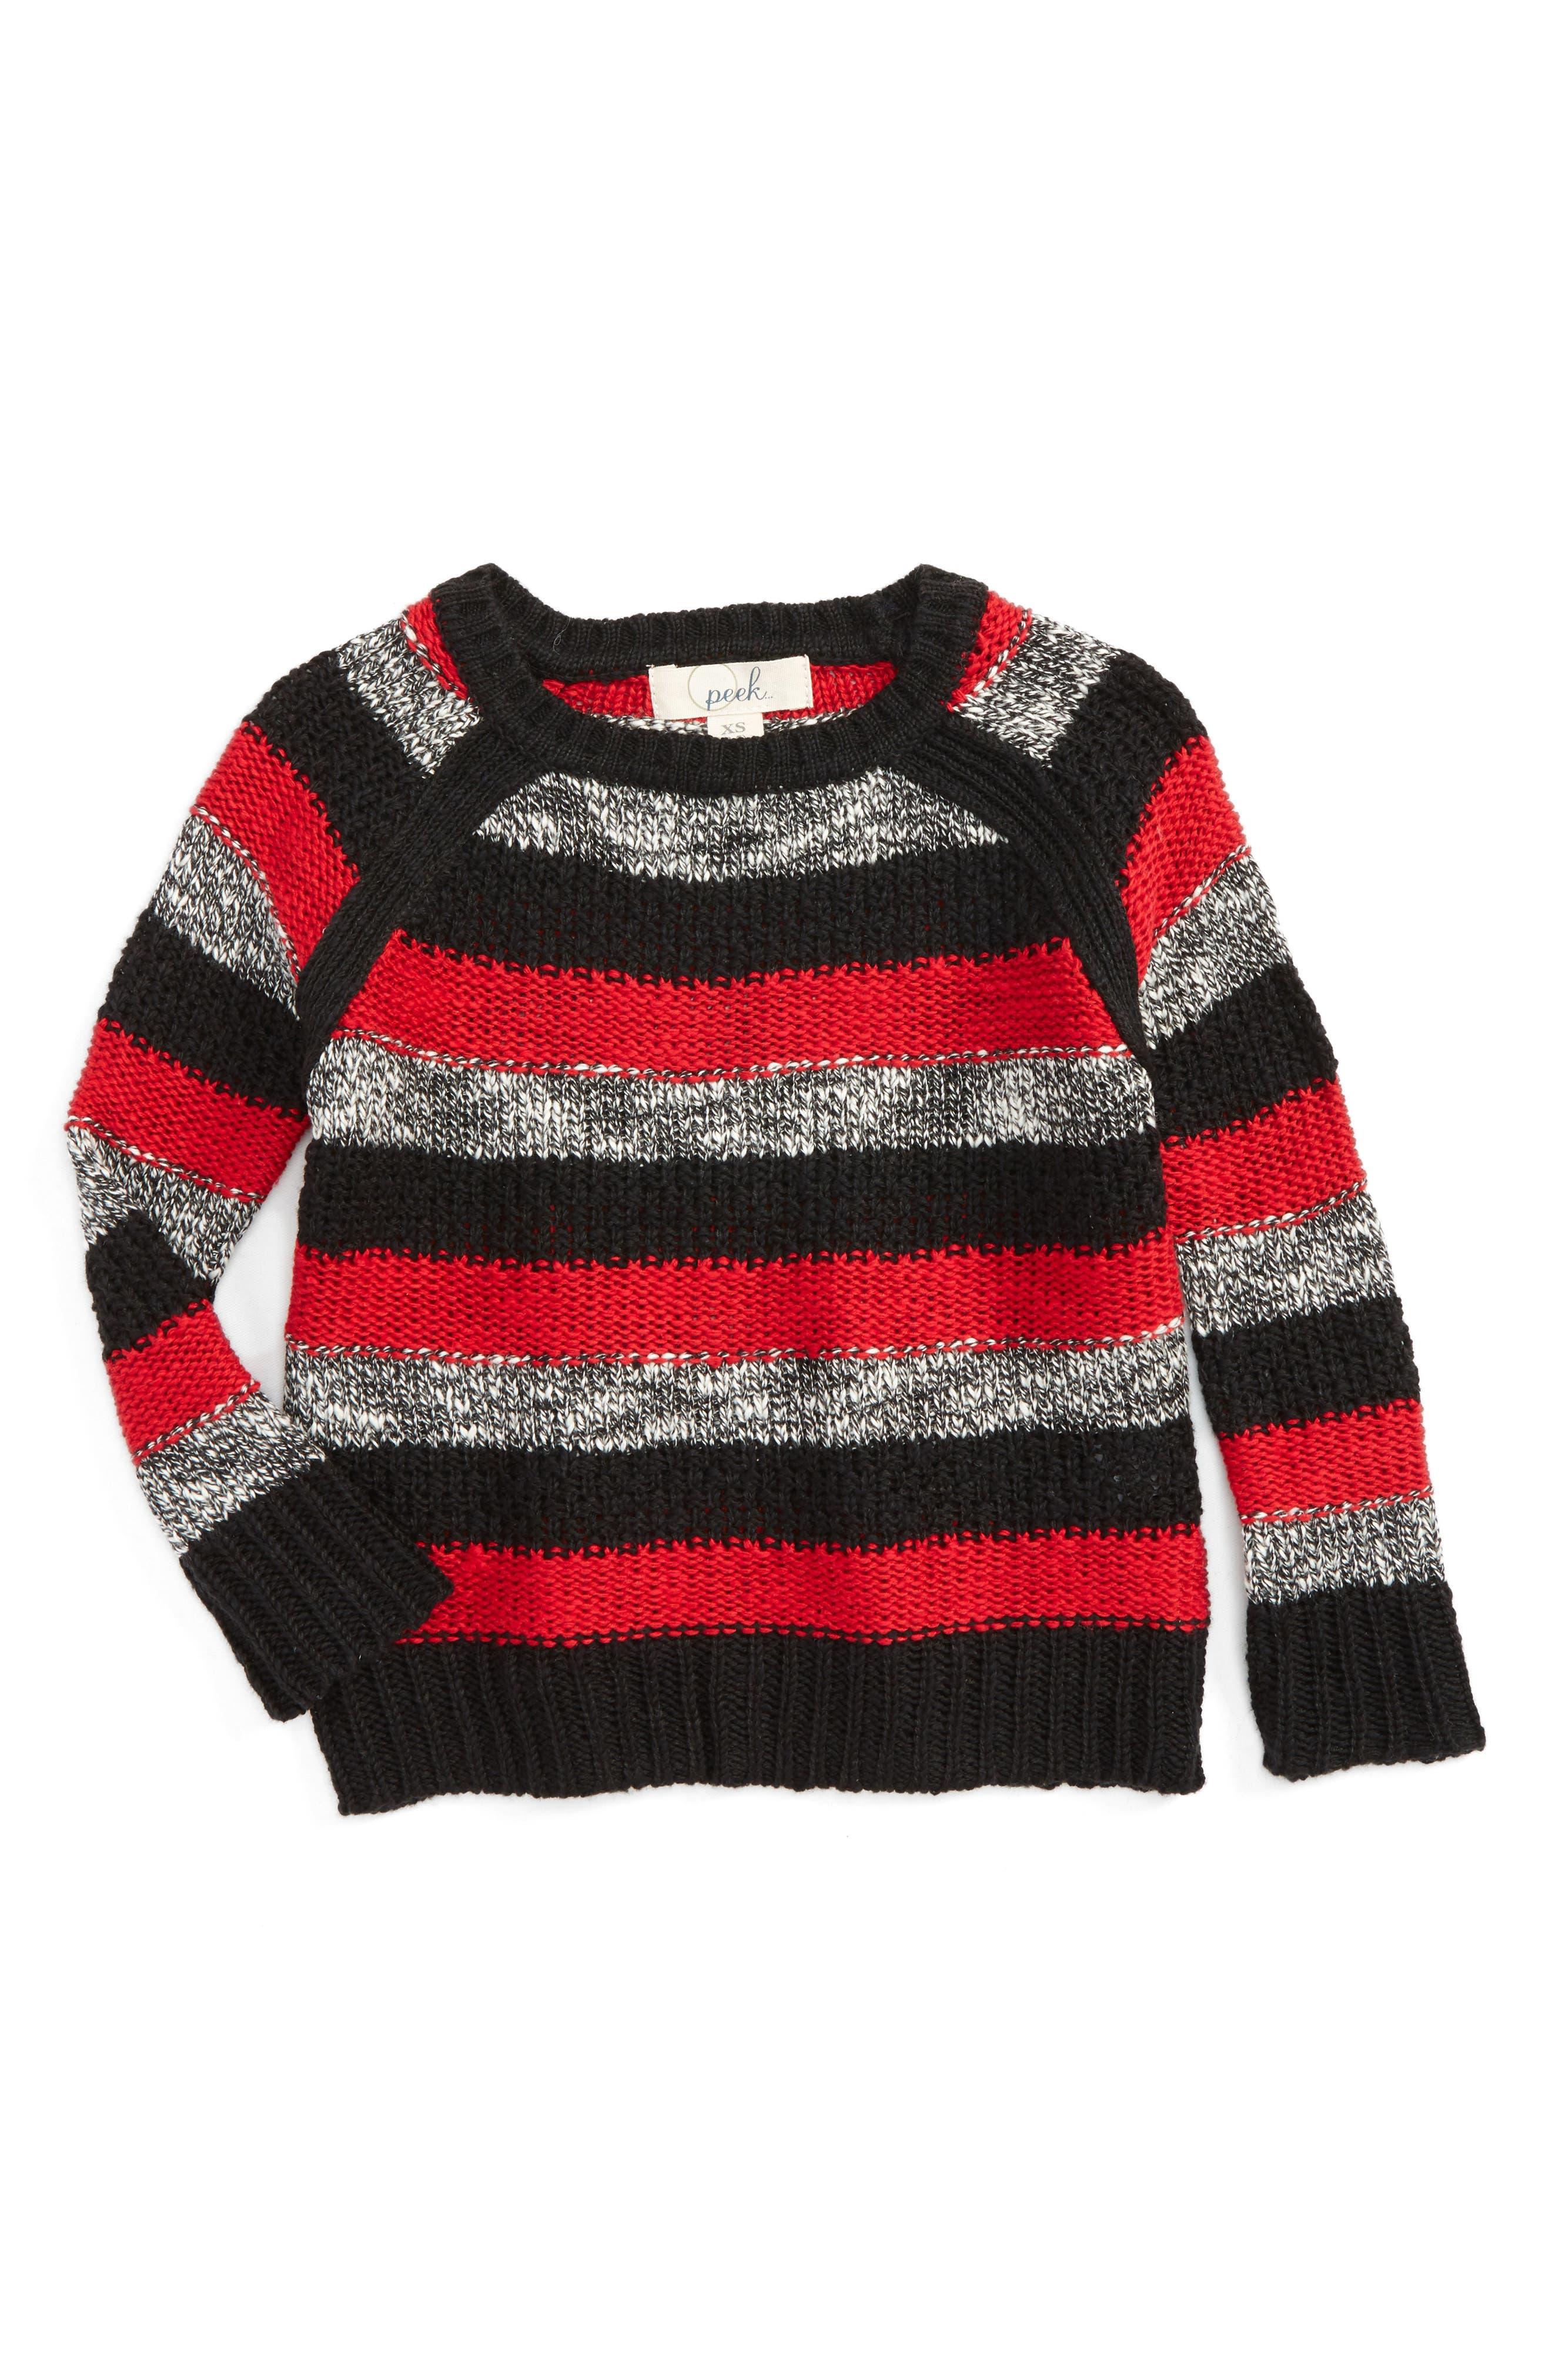 Main Image - Peek Roman Stripe Crewneck Sweater (Toddler Boys, Little Boys & Big Boys)